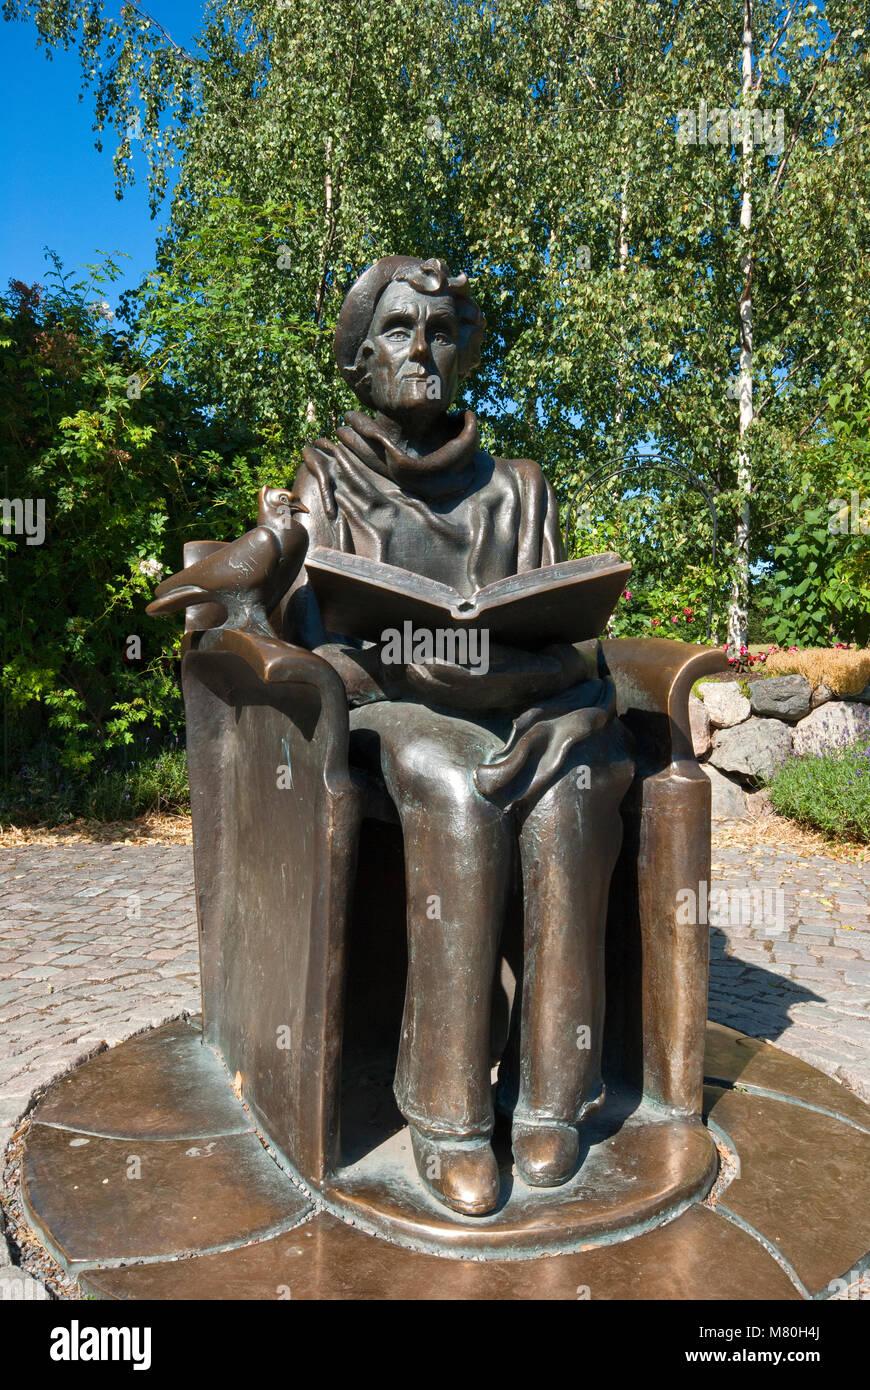 Statue of Astrid Lindgren (famous children's book author, including Pippi Longstocking) near the Junibacken - Stock Image